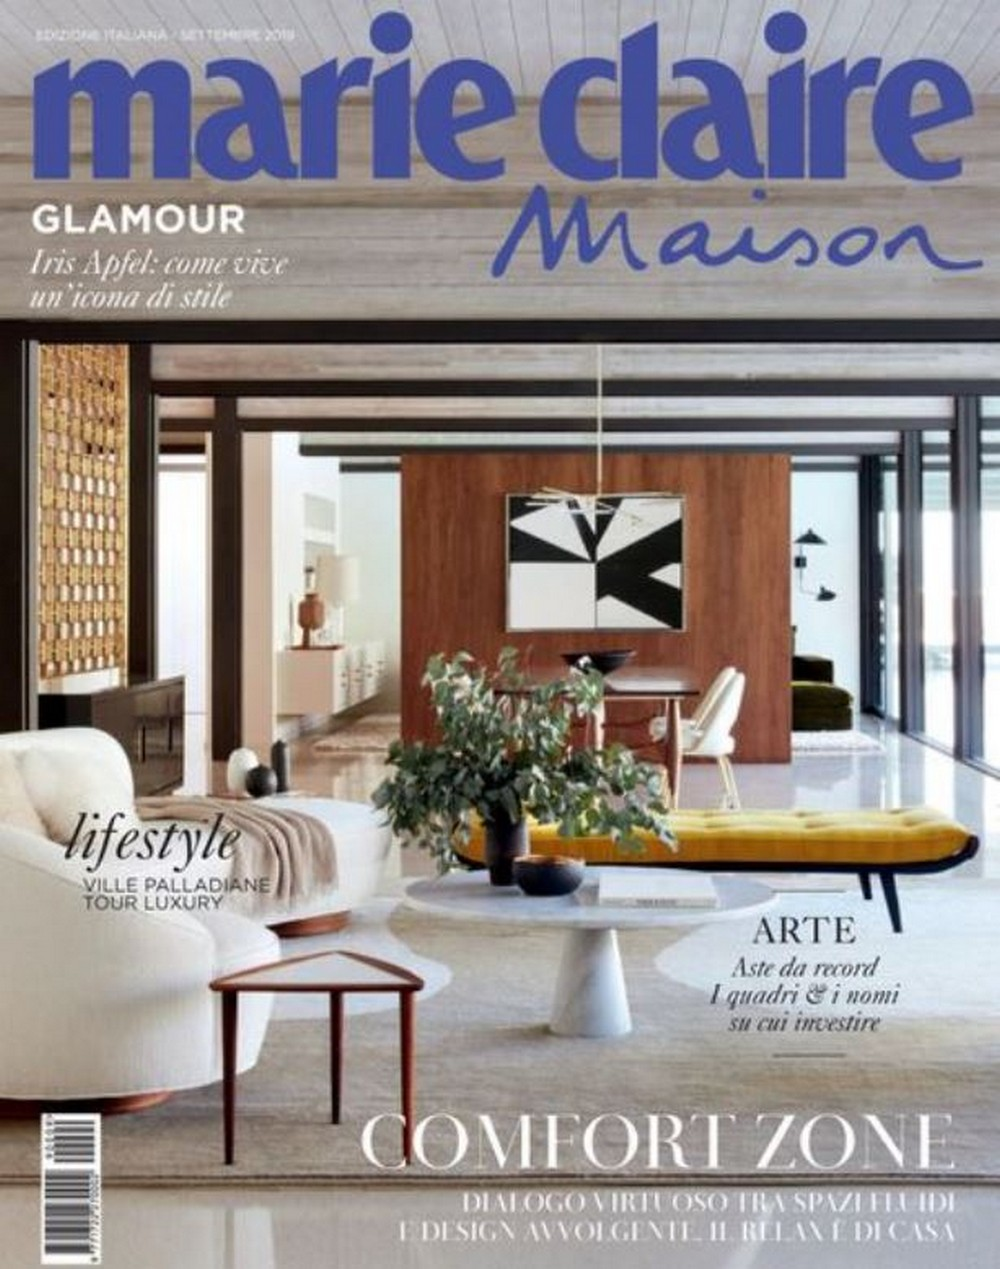 Find The 10 Best Interior Design Magazines For September! interior design magazines Find The 10  Best Interior Design Magazines For September! Find The 10 Best Interior Design Magazines For September